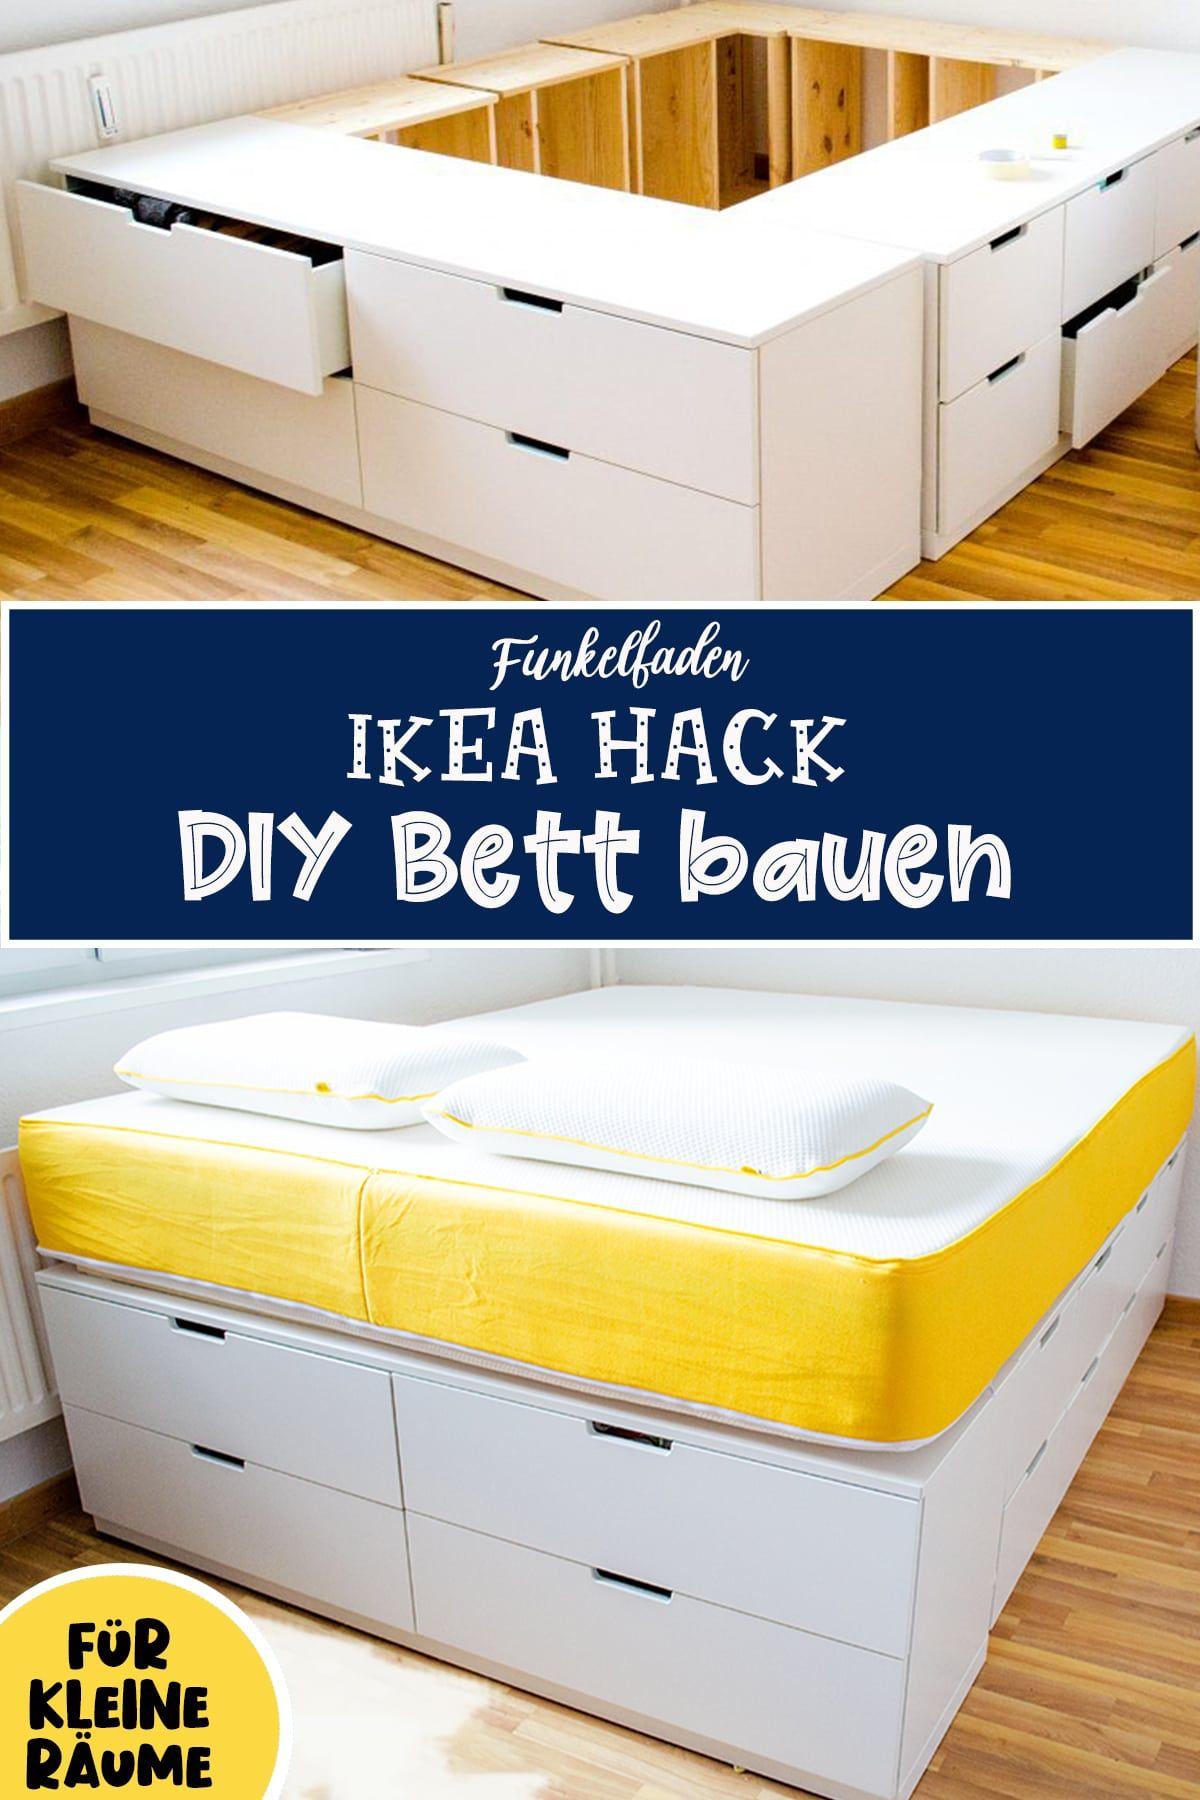 Diy Ikea Hack Plattform Bett Selber Bauen Aus Ikea Kommoden Werbung In 2020 Bett Selber Bauen Ikea Kommode Bett Selber Bauen Anleitung